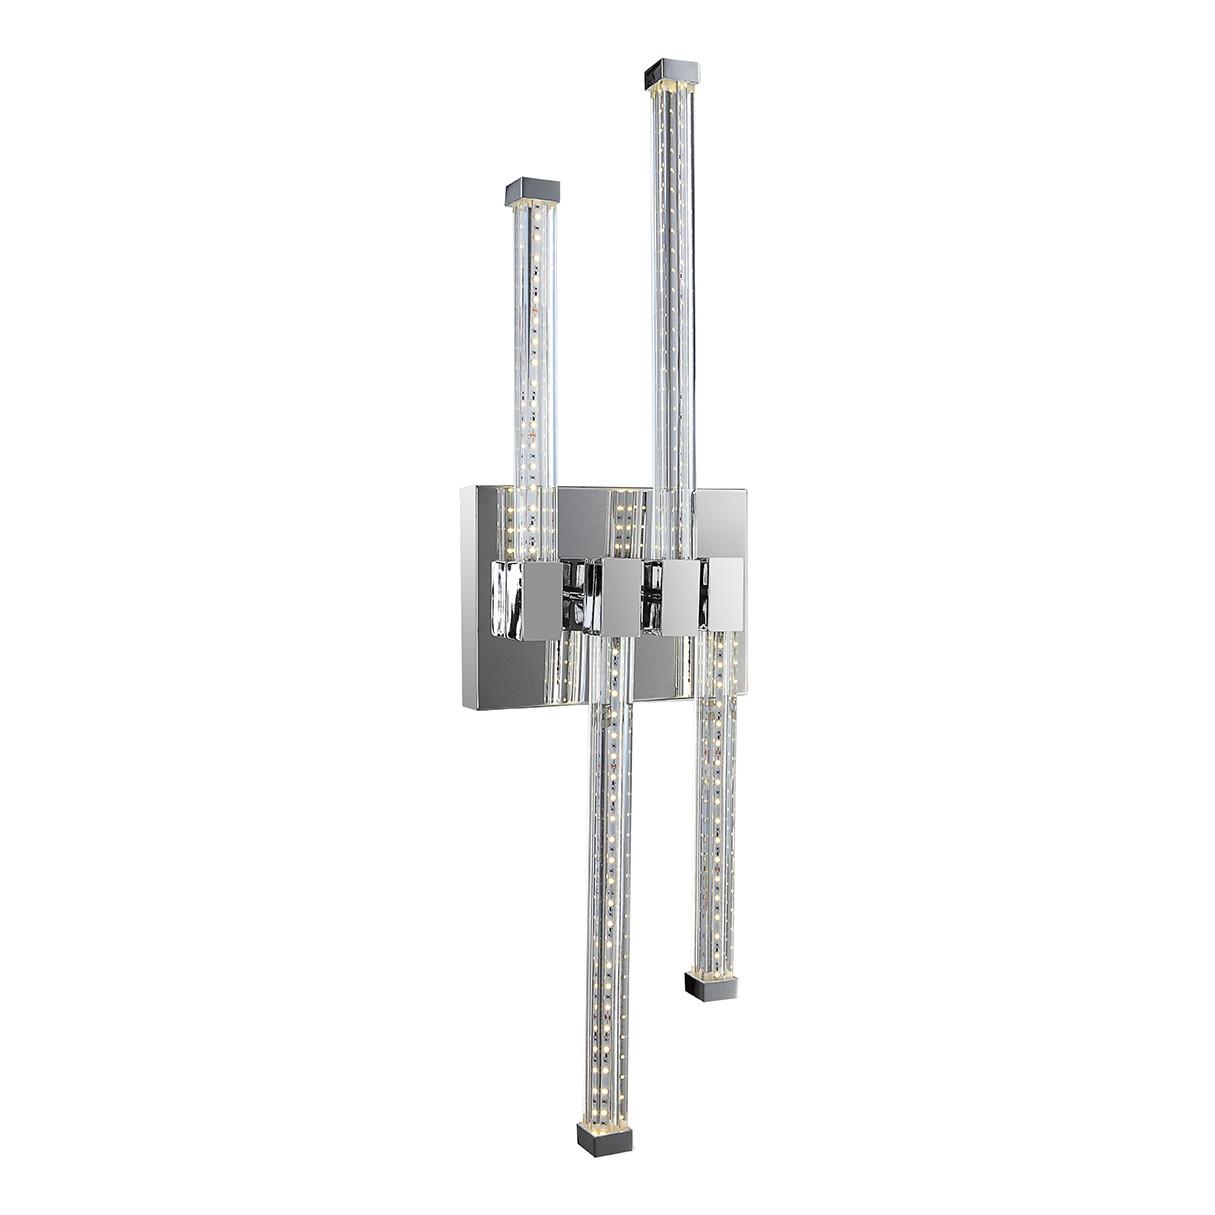 LED-Deckenleuchte Tschuradpra III 1-flammig ● Silber Metall- verchromt- Globo Lighting A+